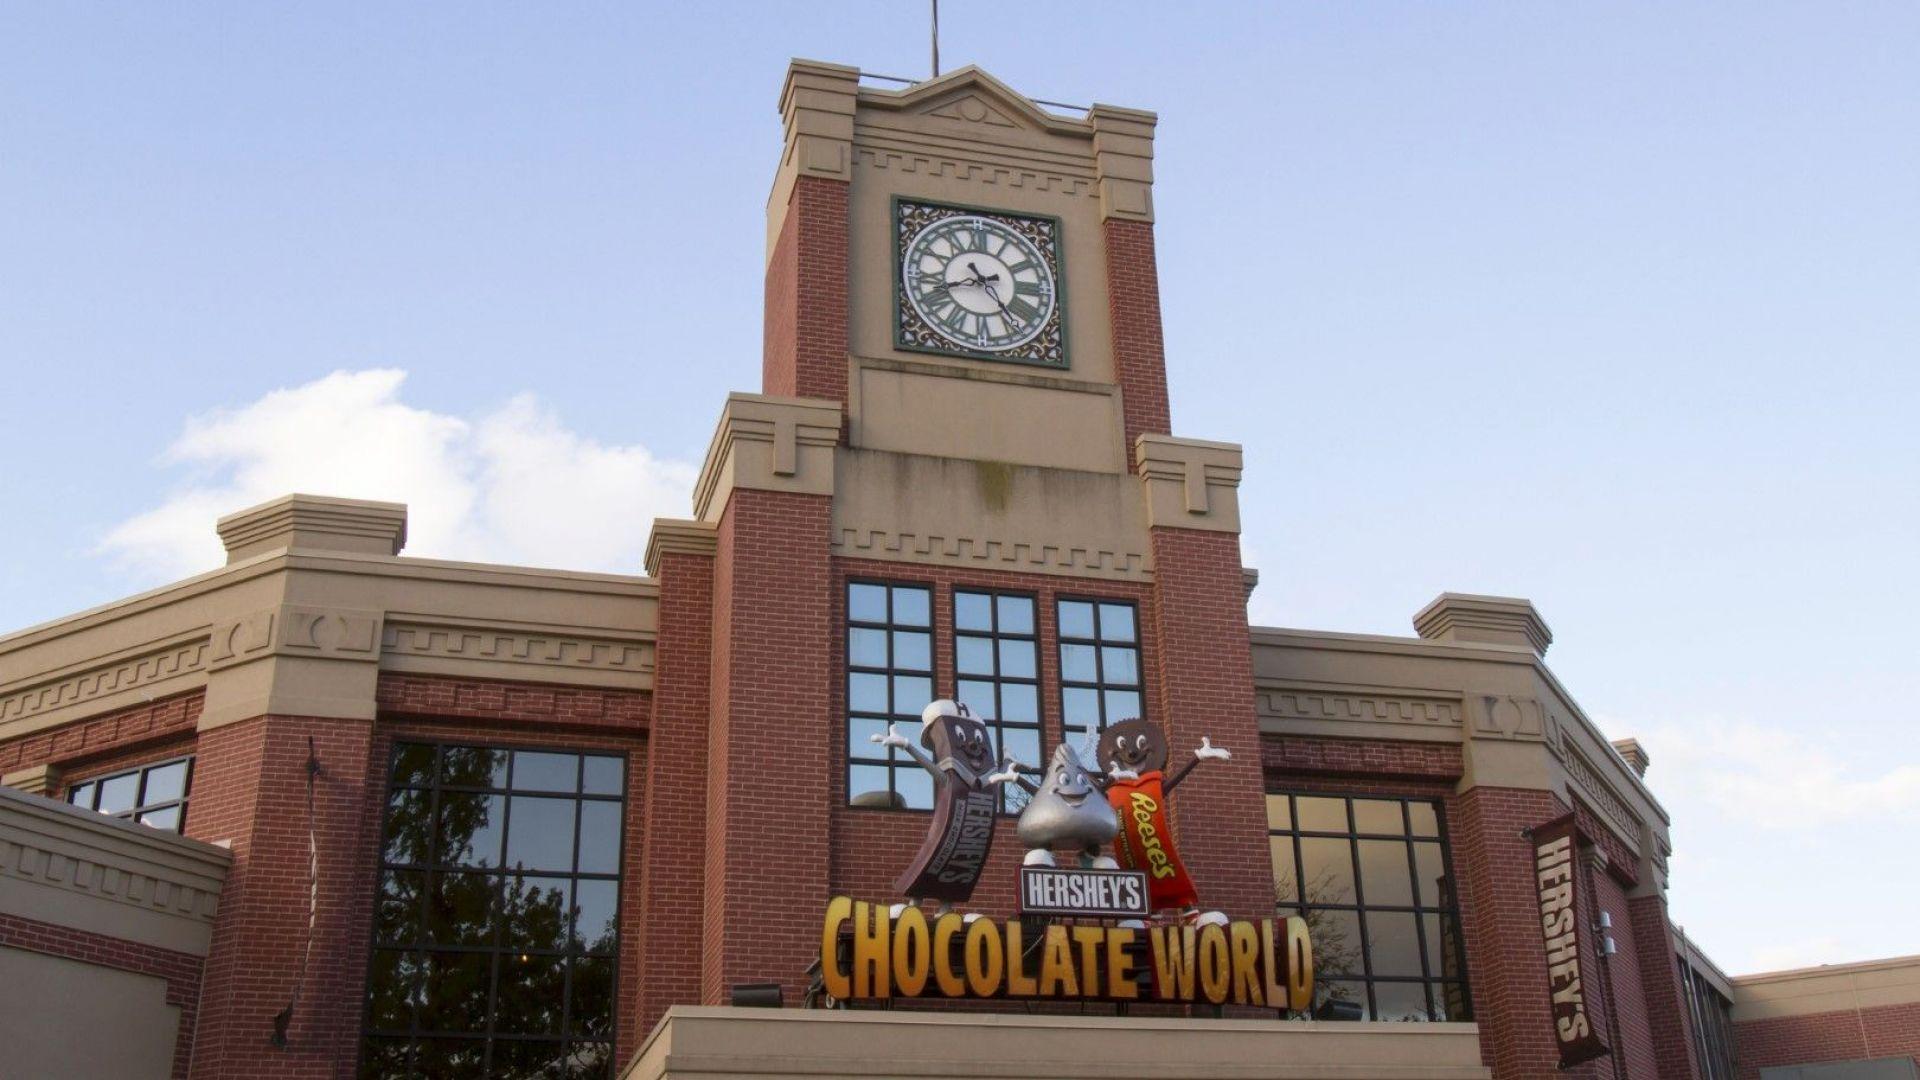 Кот д'Ивоар отмени санкциите срещу шоколадовия гигант Хърши